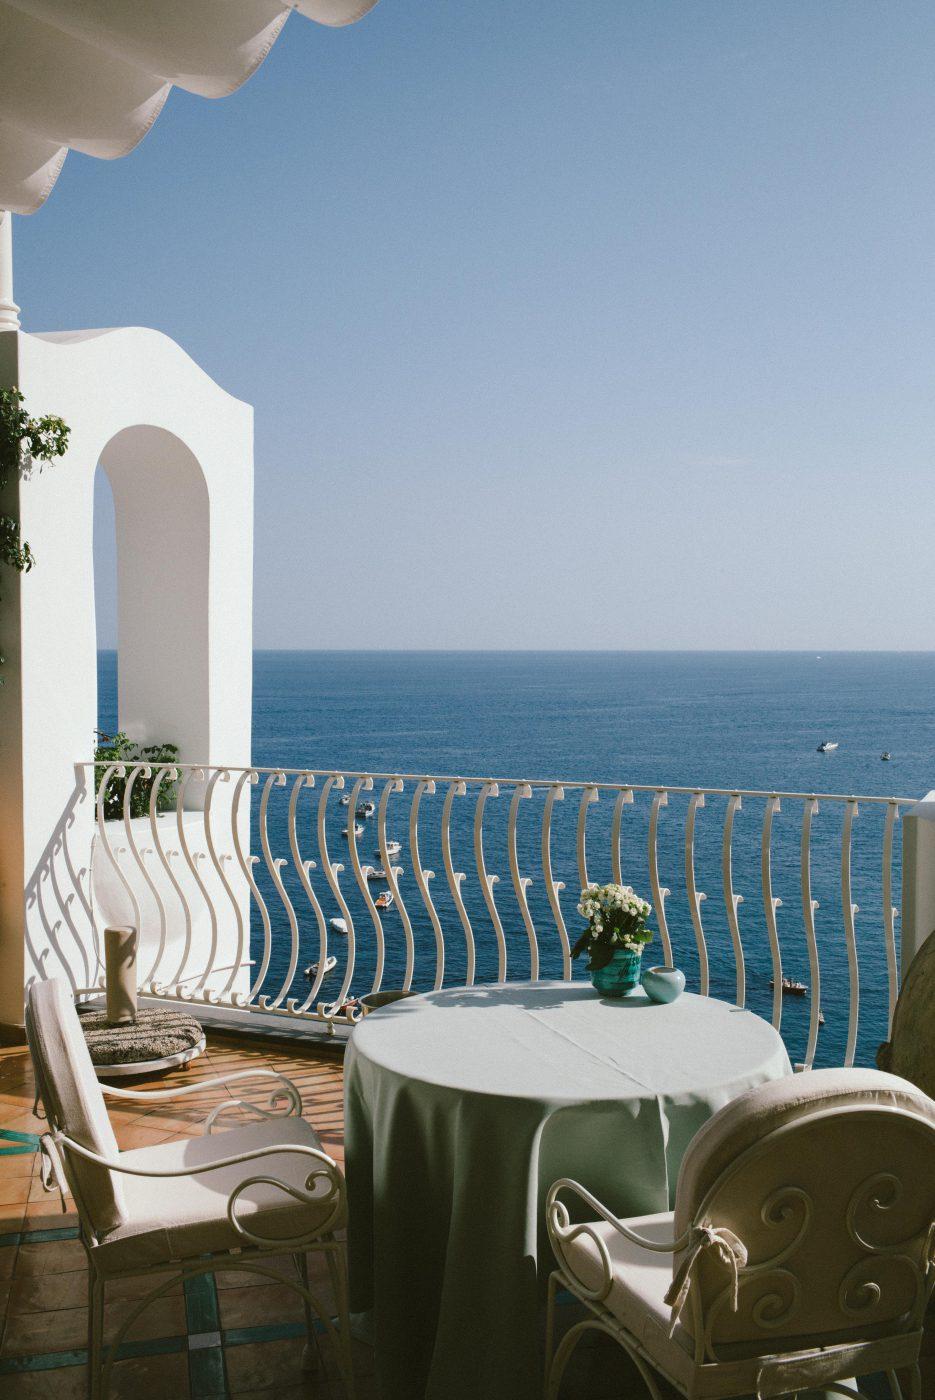 Amalfi visual journey - Raf Maes Positano